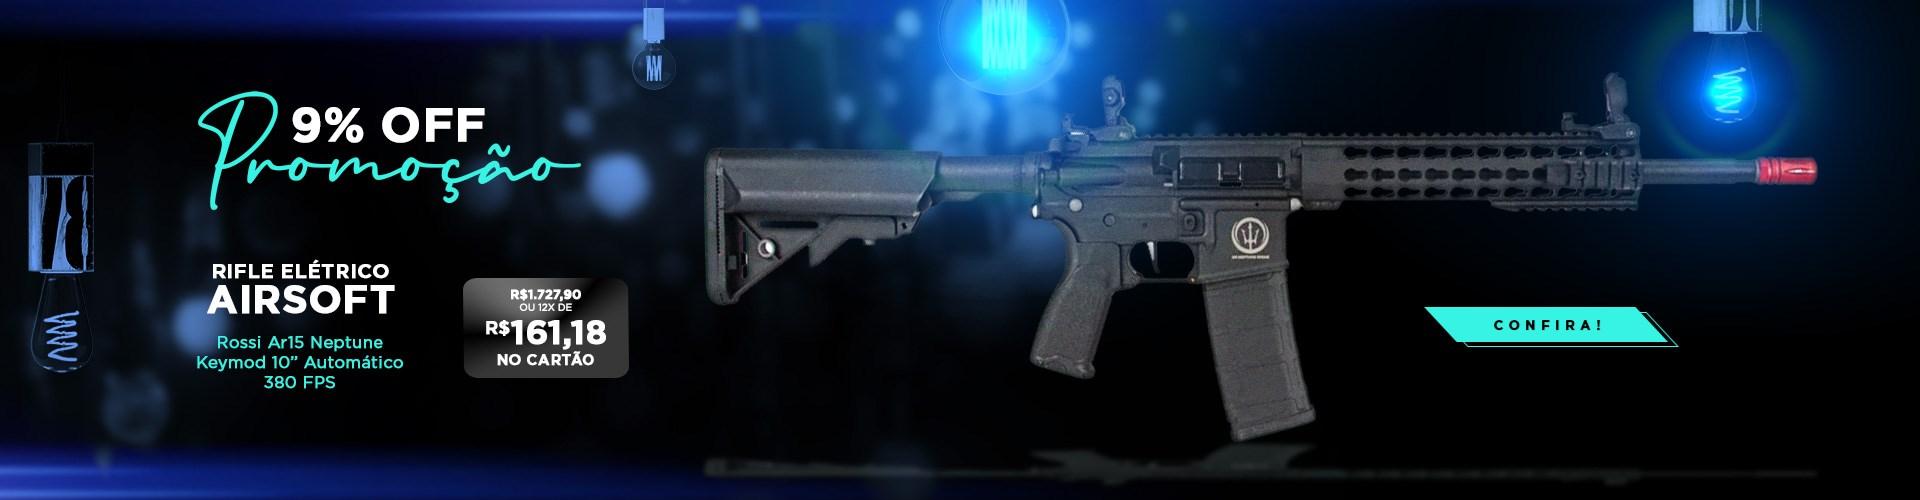 Rifle Airsoft Neptune Keymood 10 Rossi